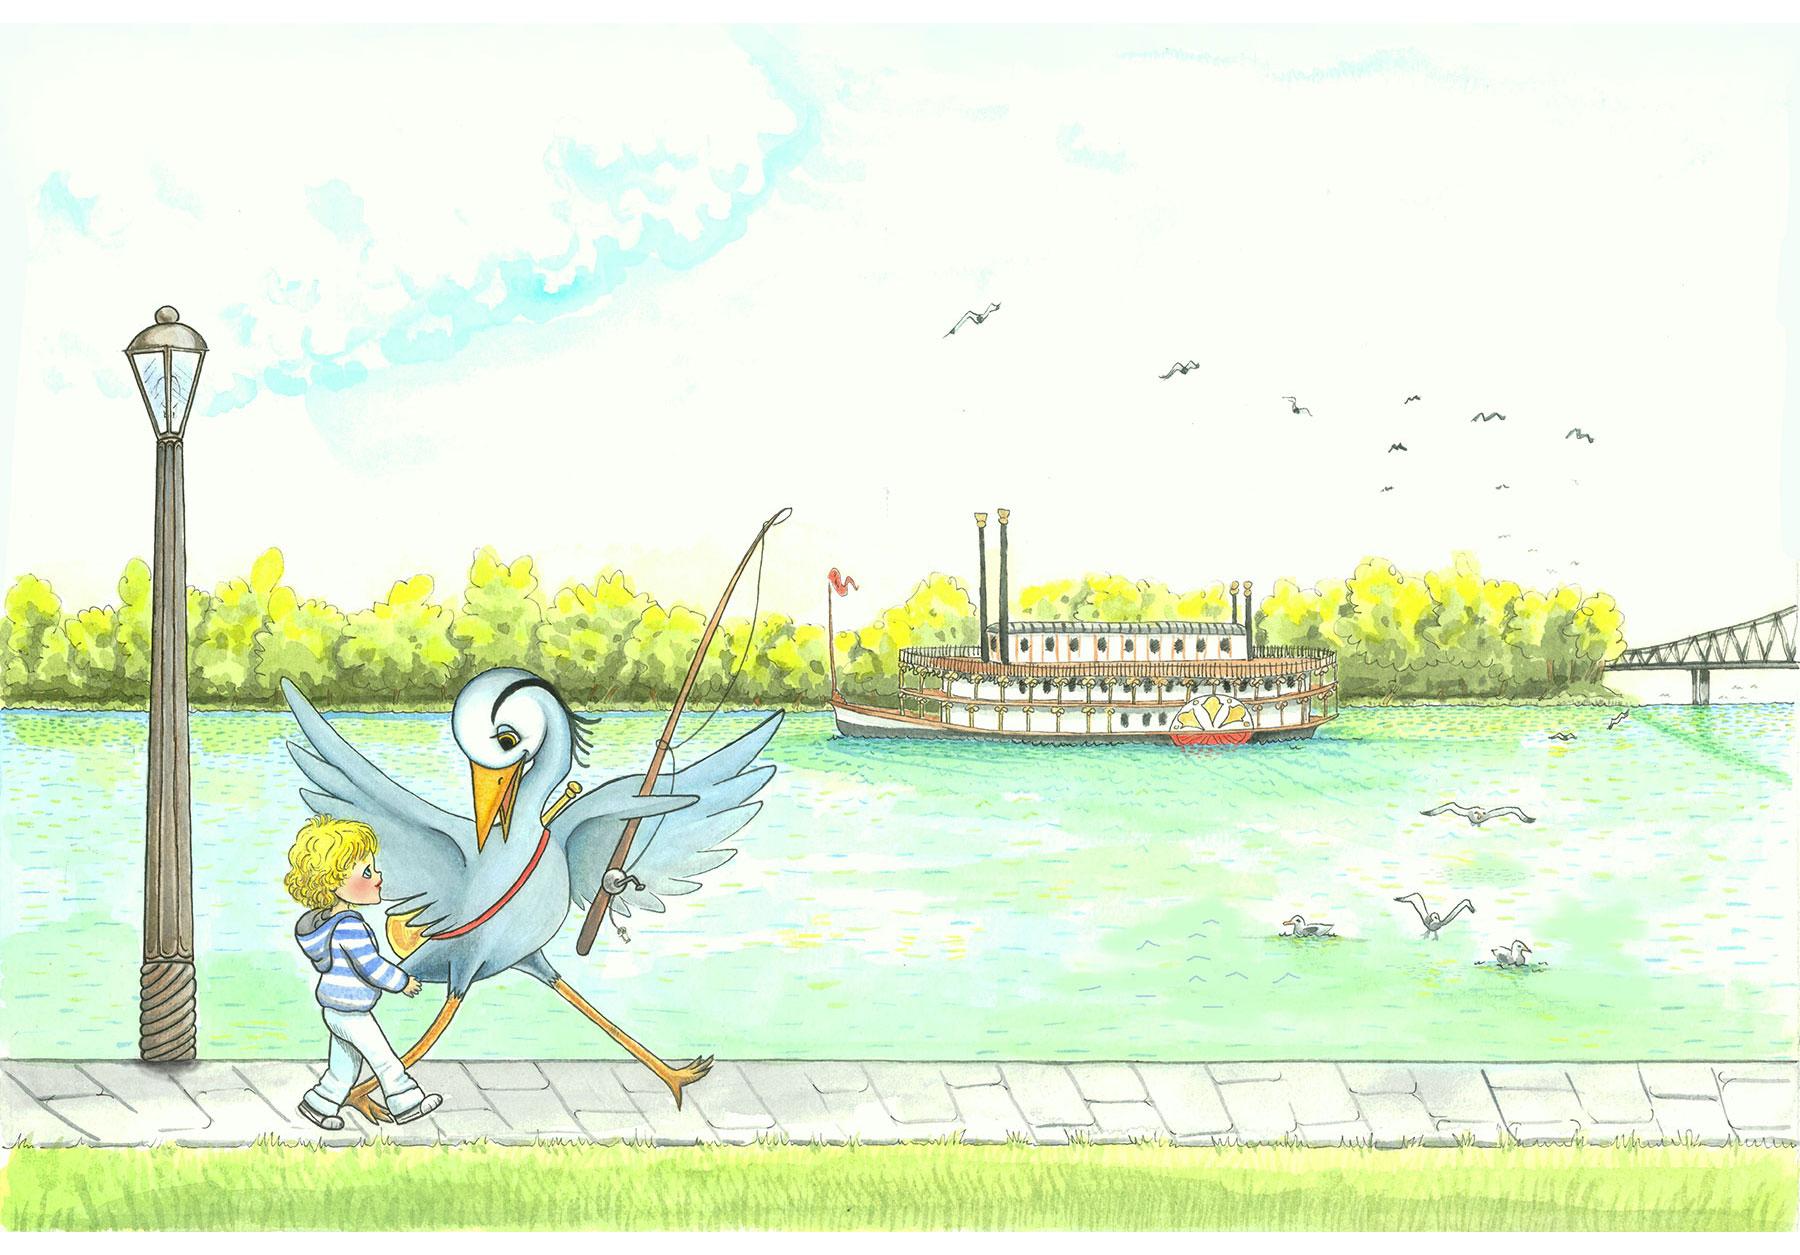 The Illustrations